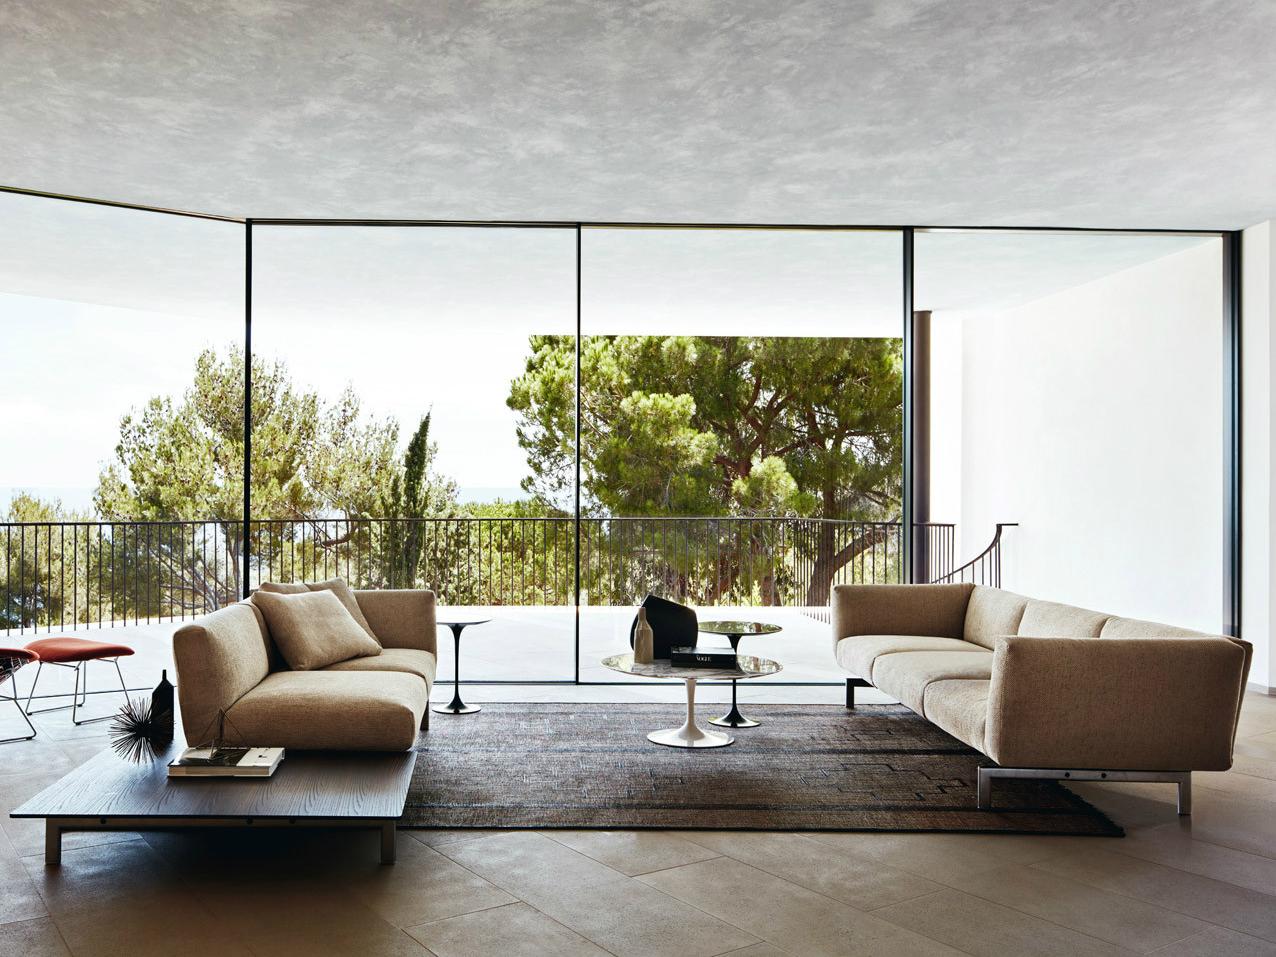 Knoll lissoni avio sofa designer contemporary furniture